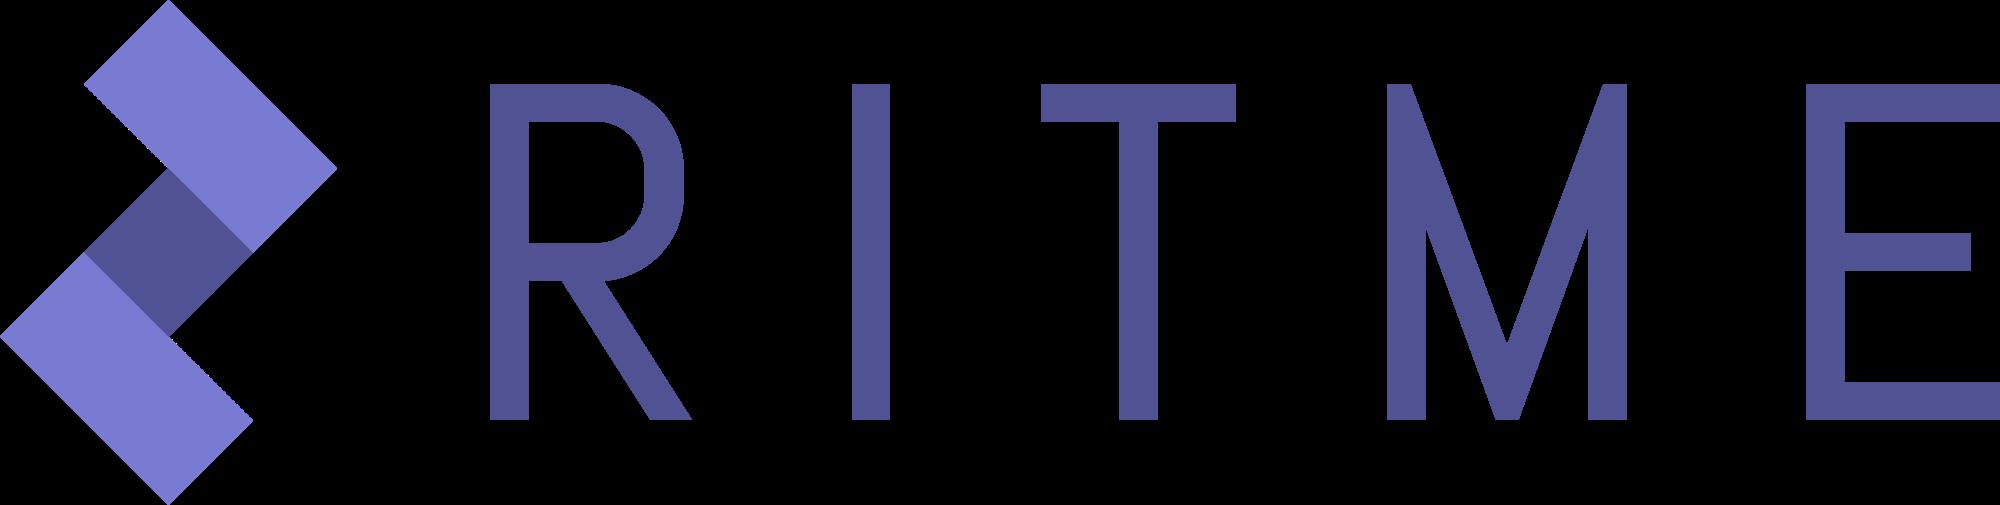 Ritme-app